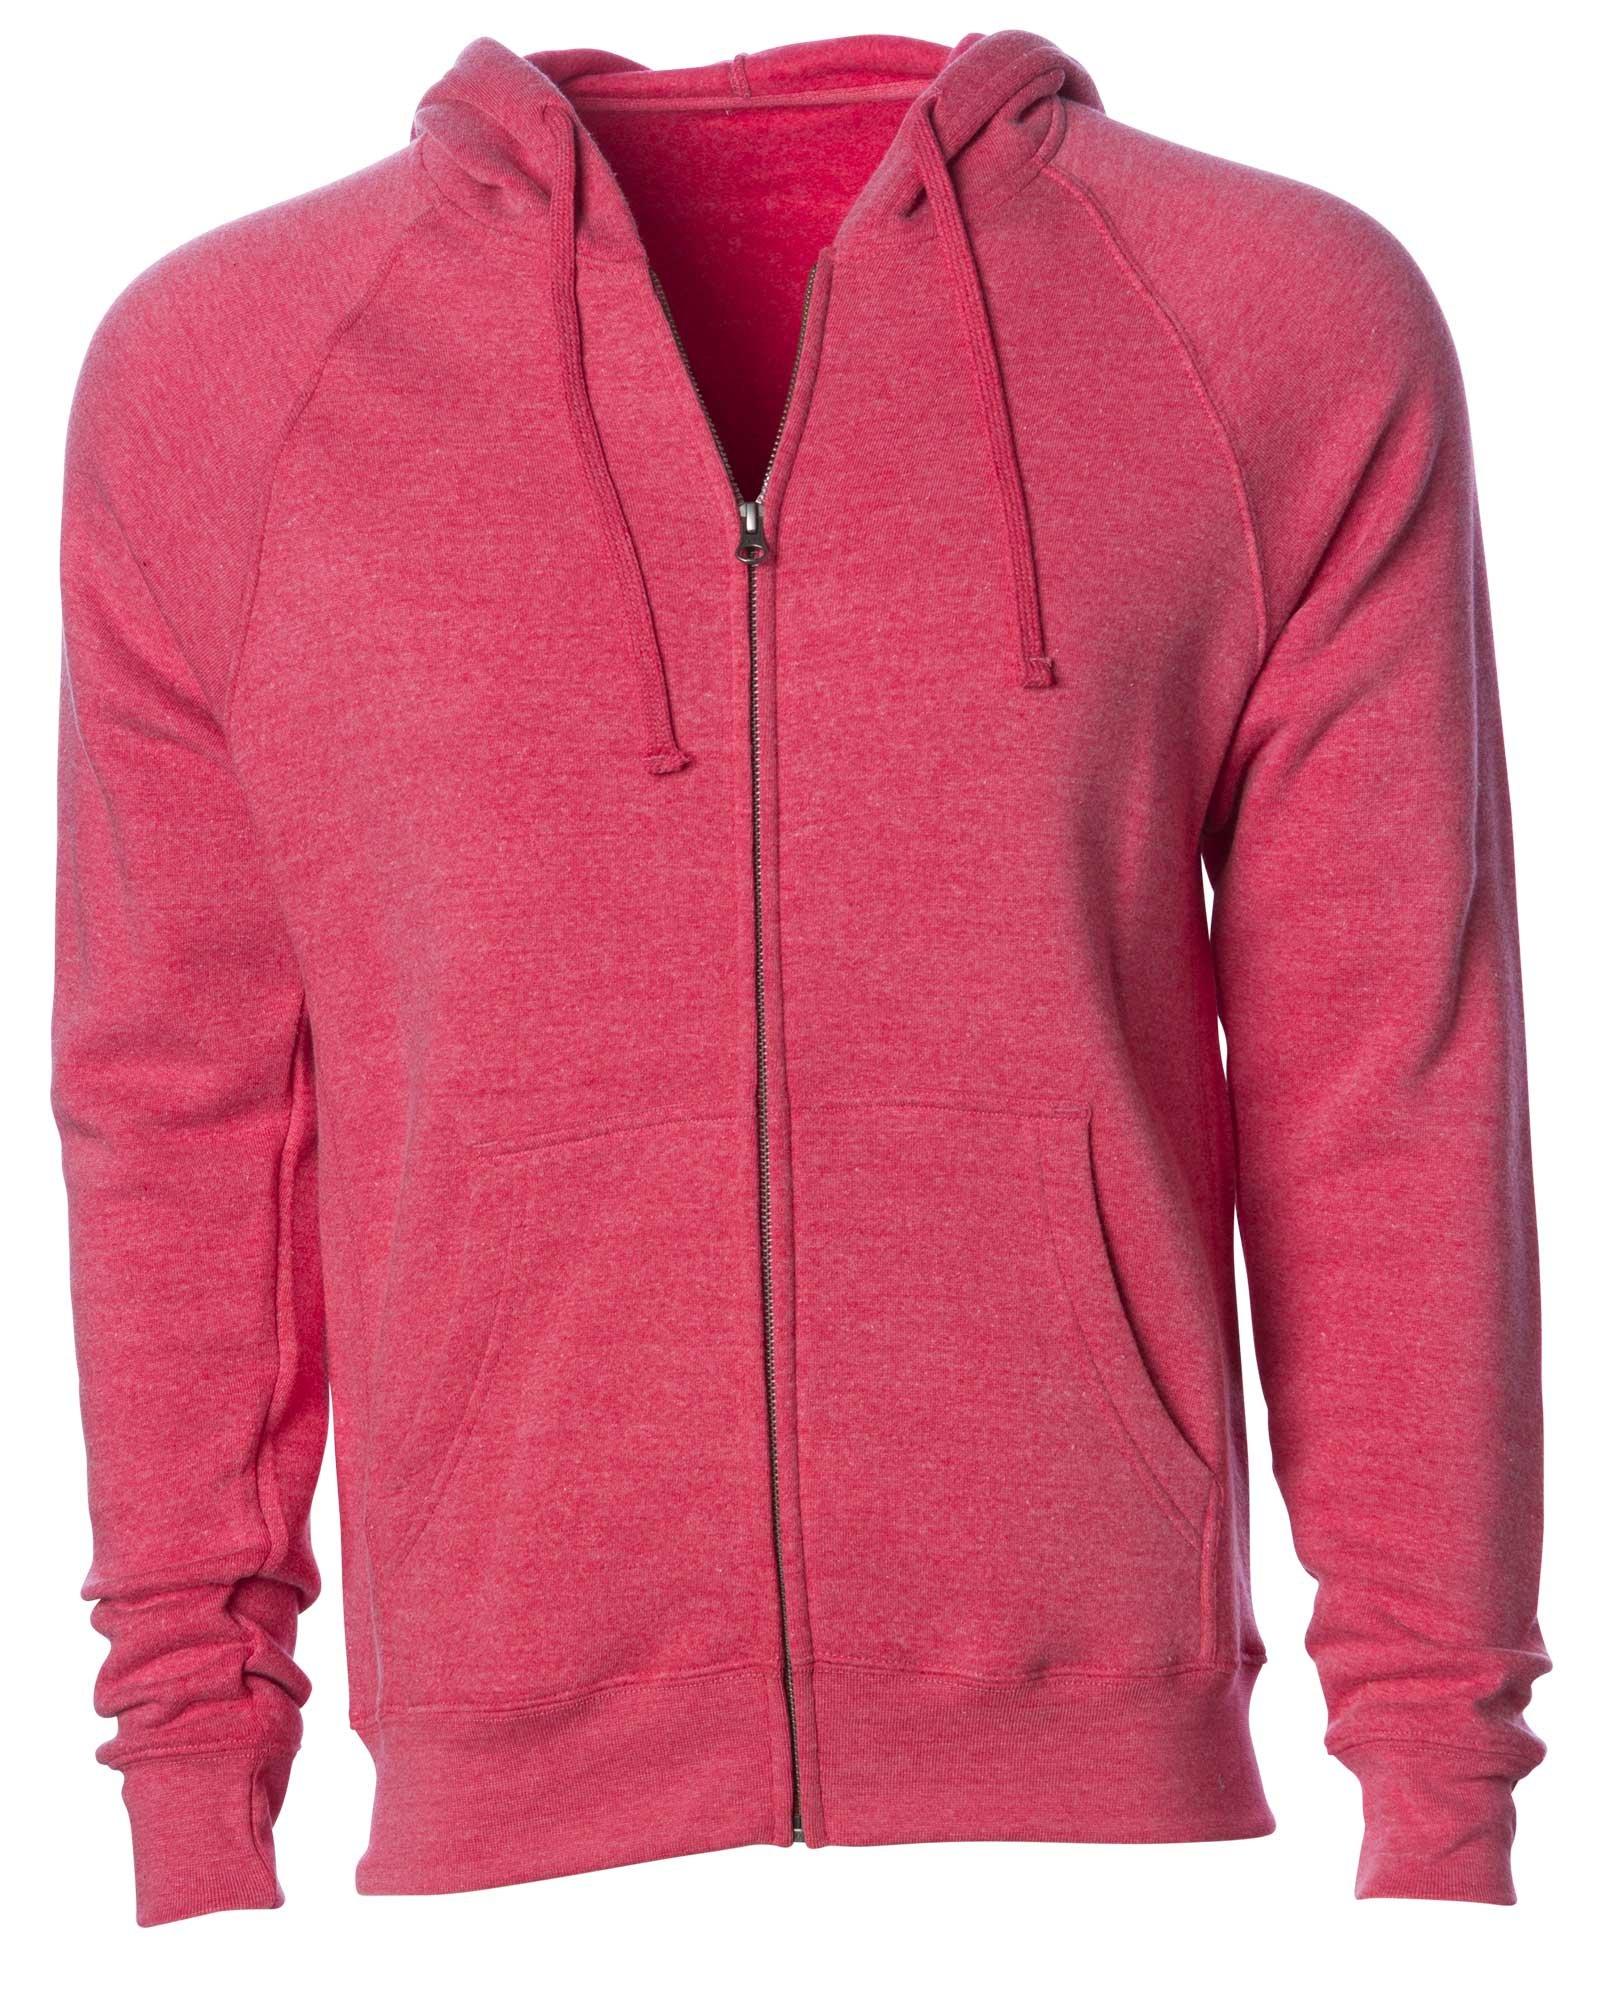 Global Lightweight Zip Up Hoodies for Women Extra Soft Fleece Hooded Sweatshirt Pink XXL